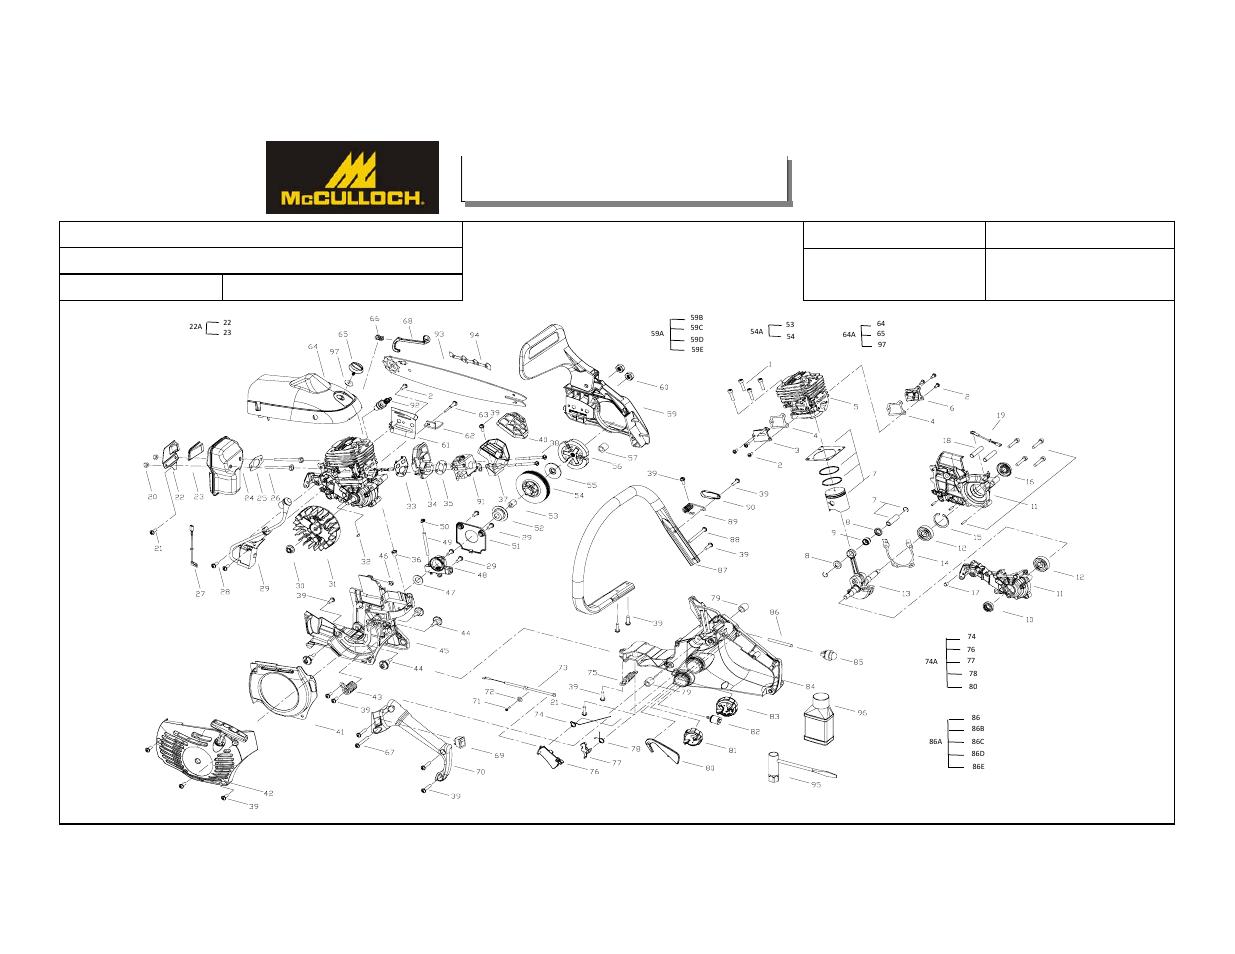 F-iplmcc1435apg1.pdf, Mcc1435a service spare parts list